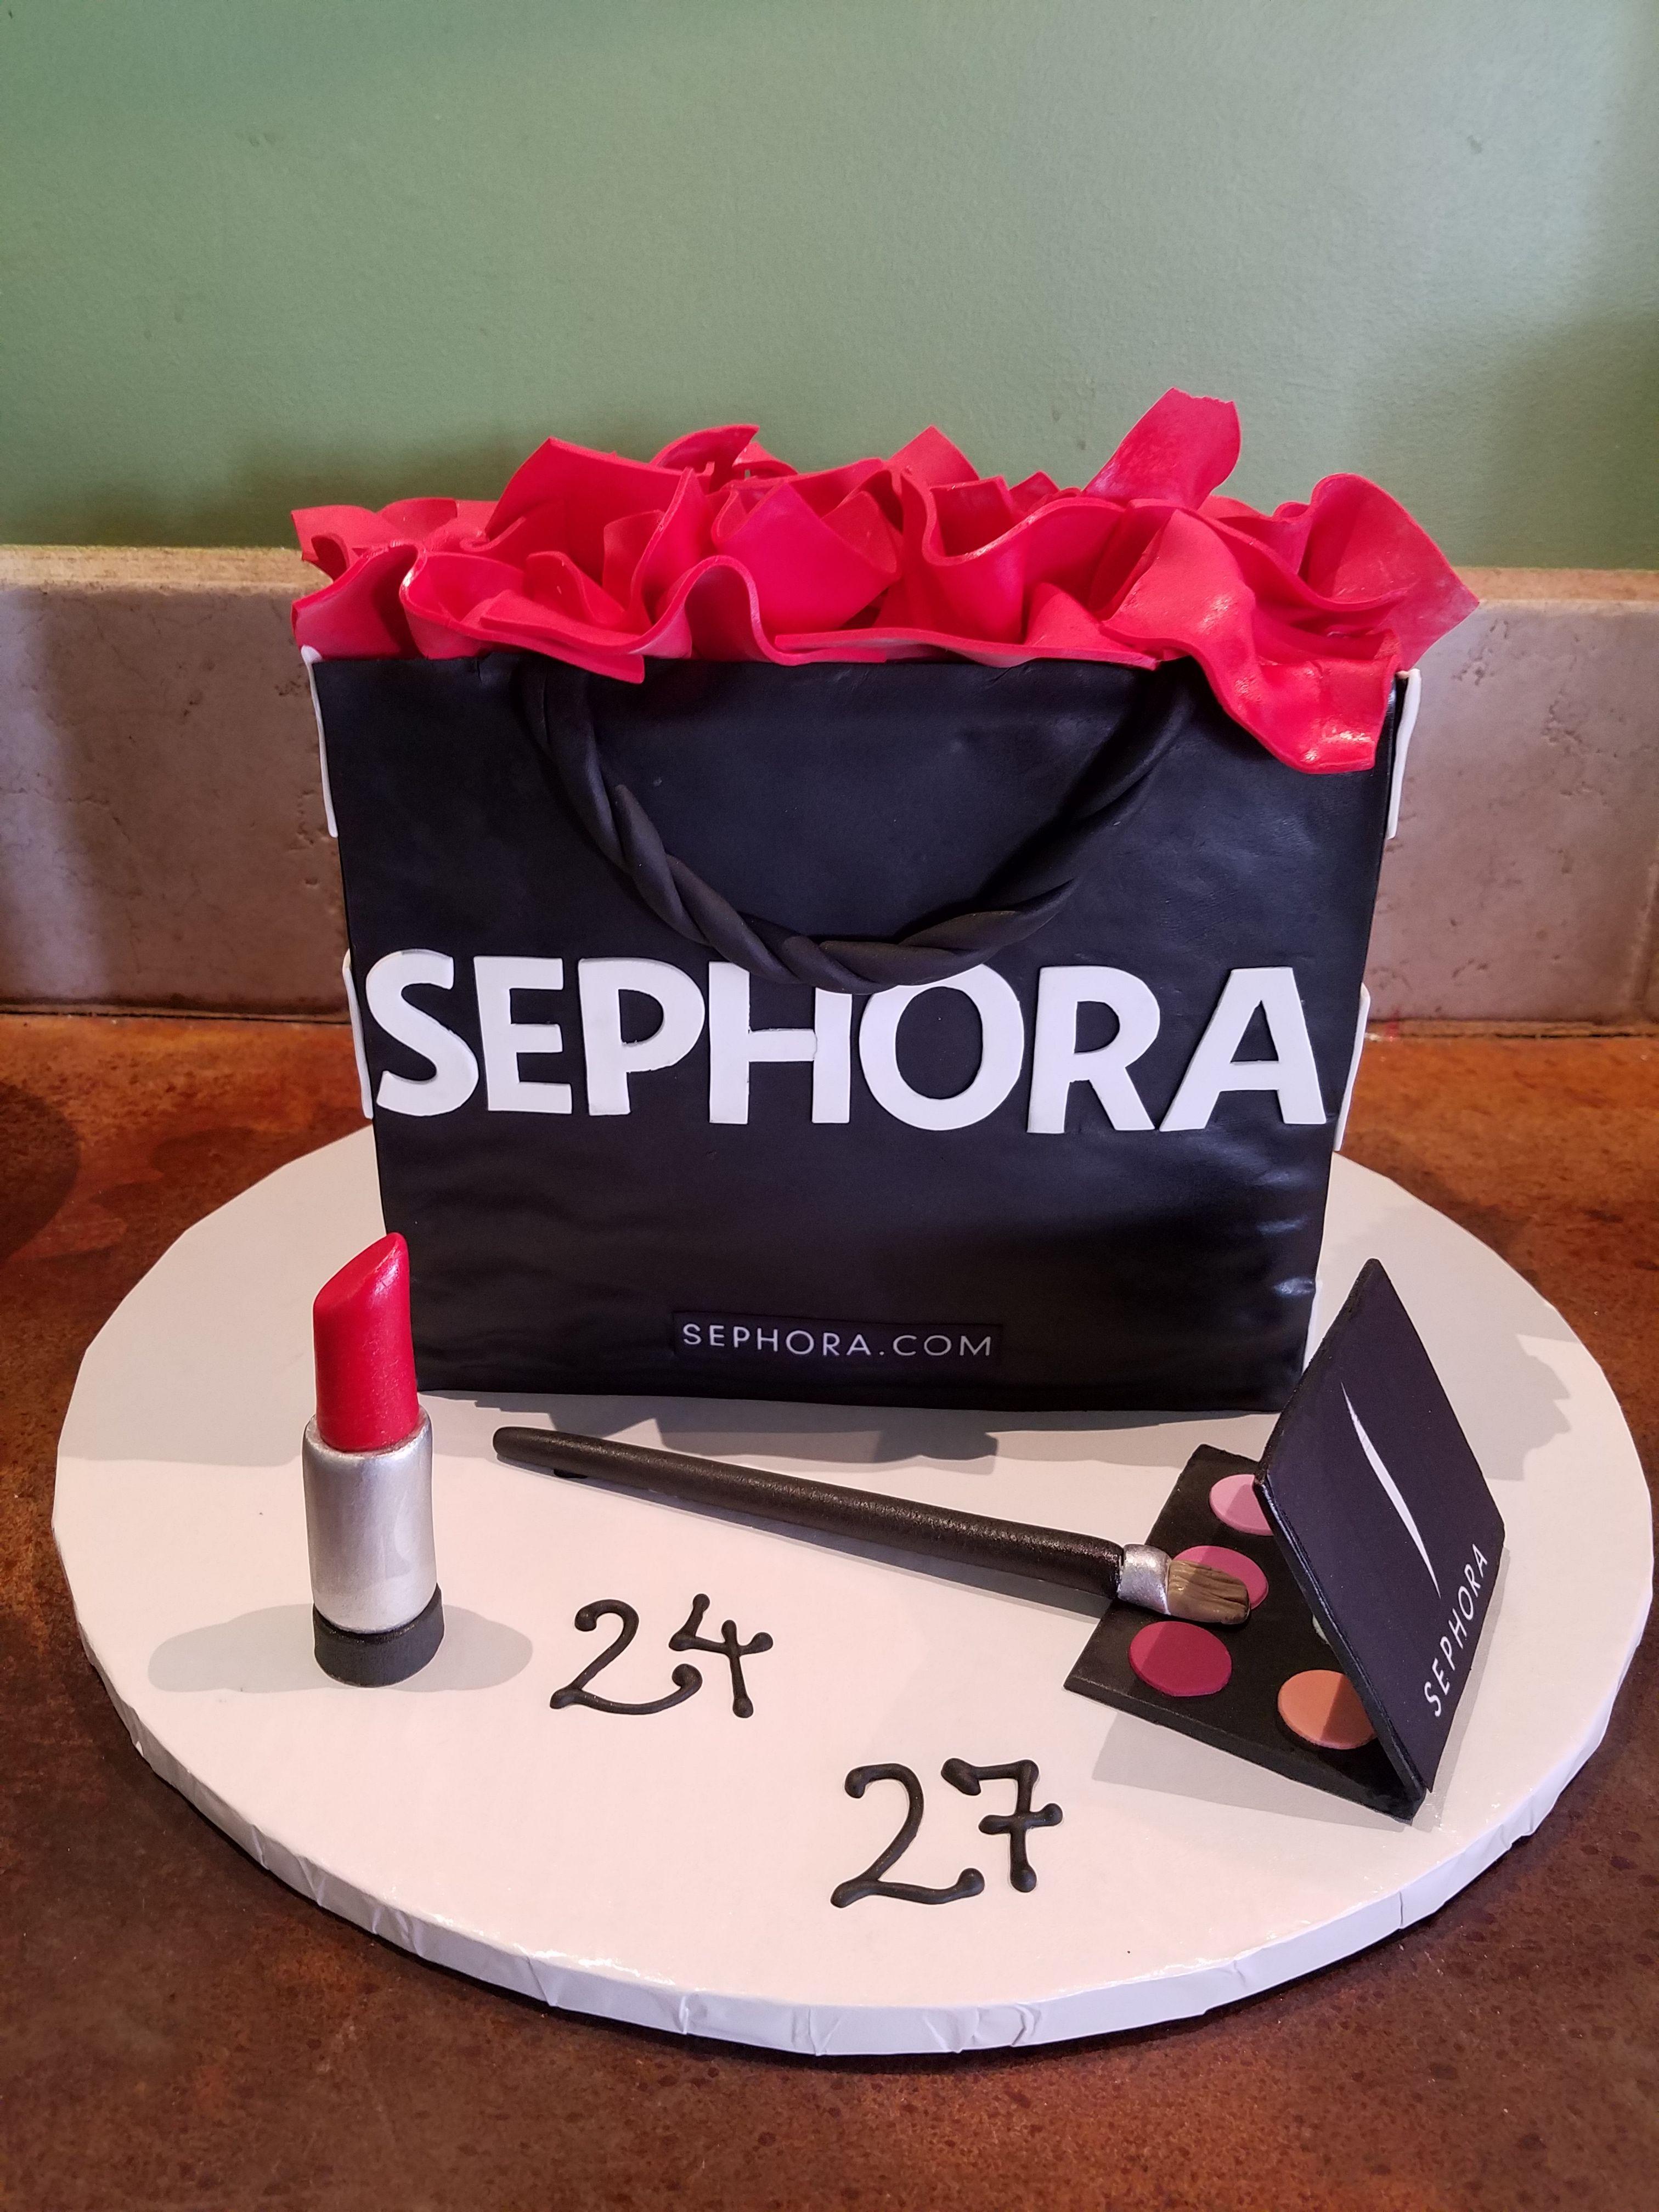 Sephora Makeup bag cake Cake bars, Custom cakes, Cake